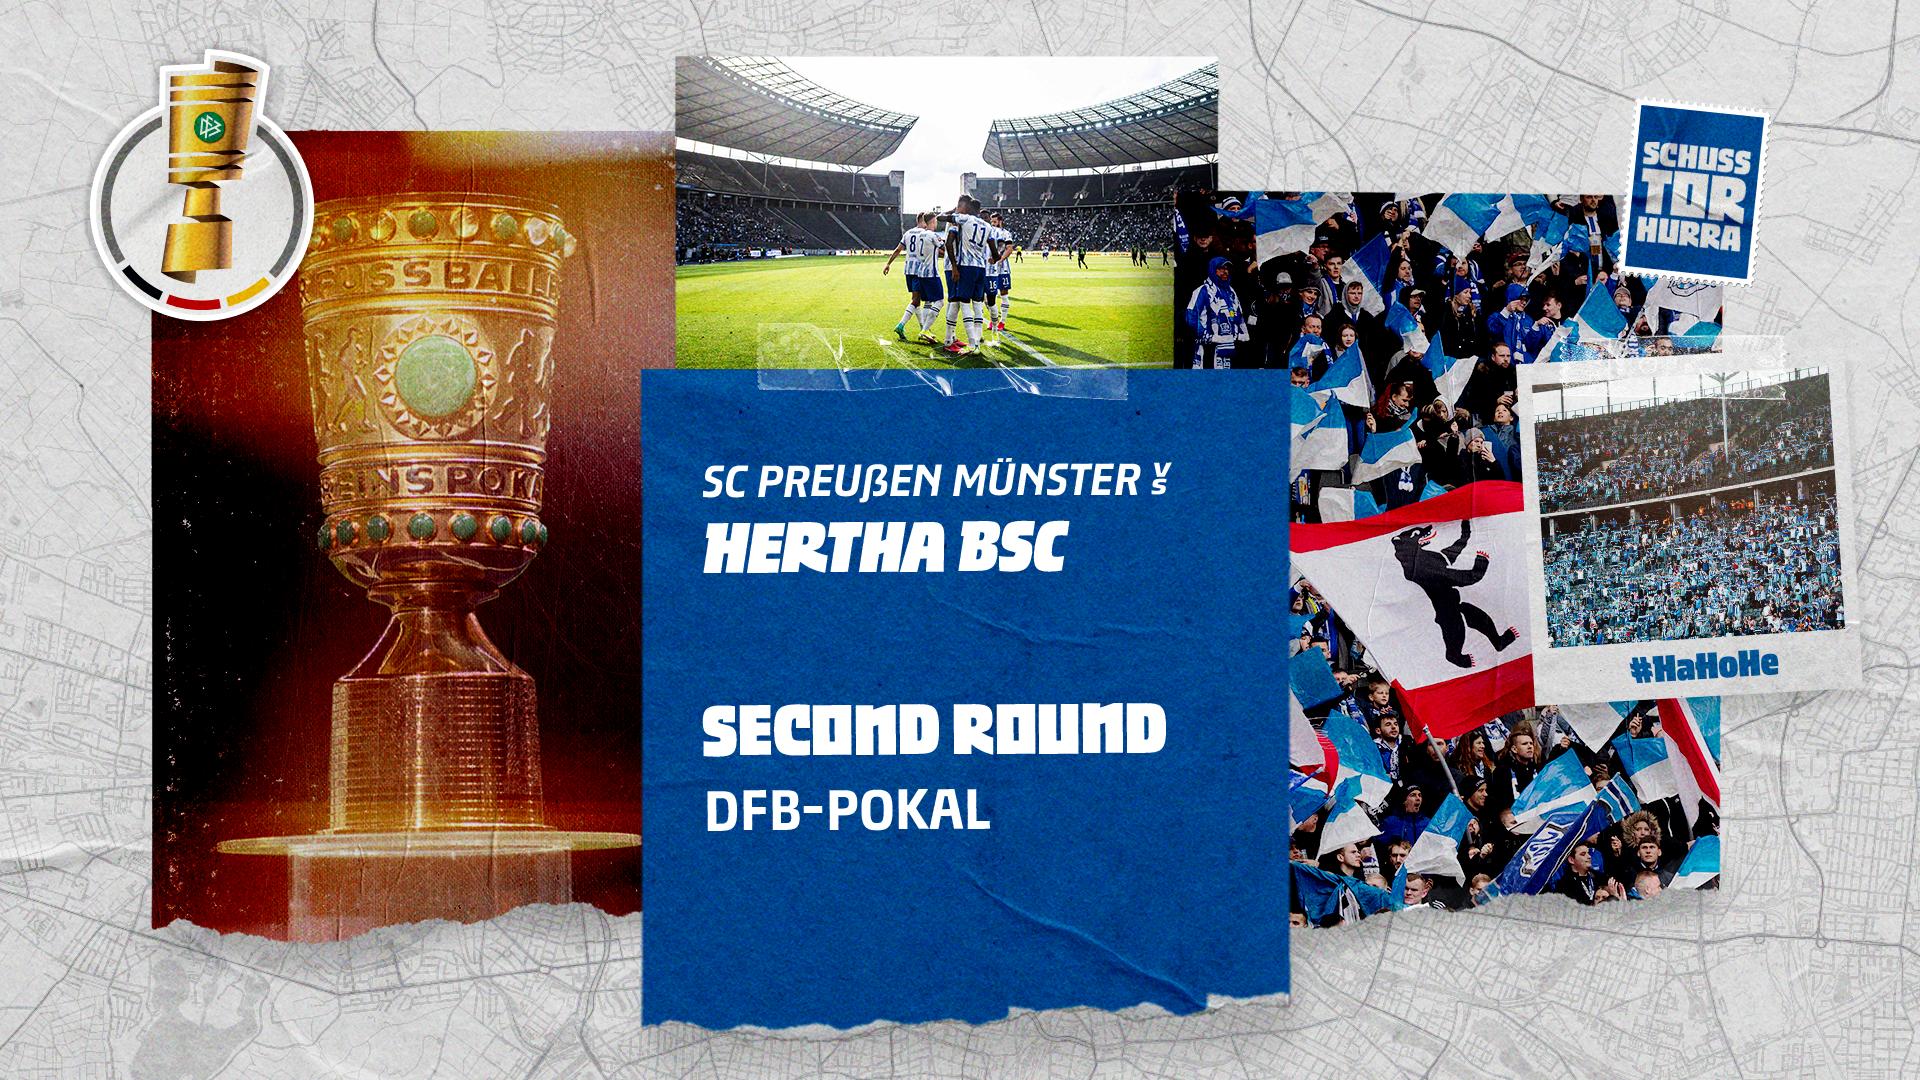 Preußen Münster vs. Hertha BSC